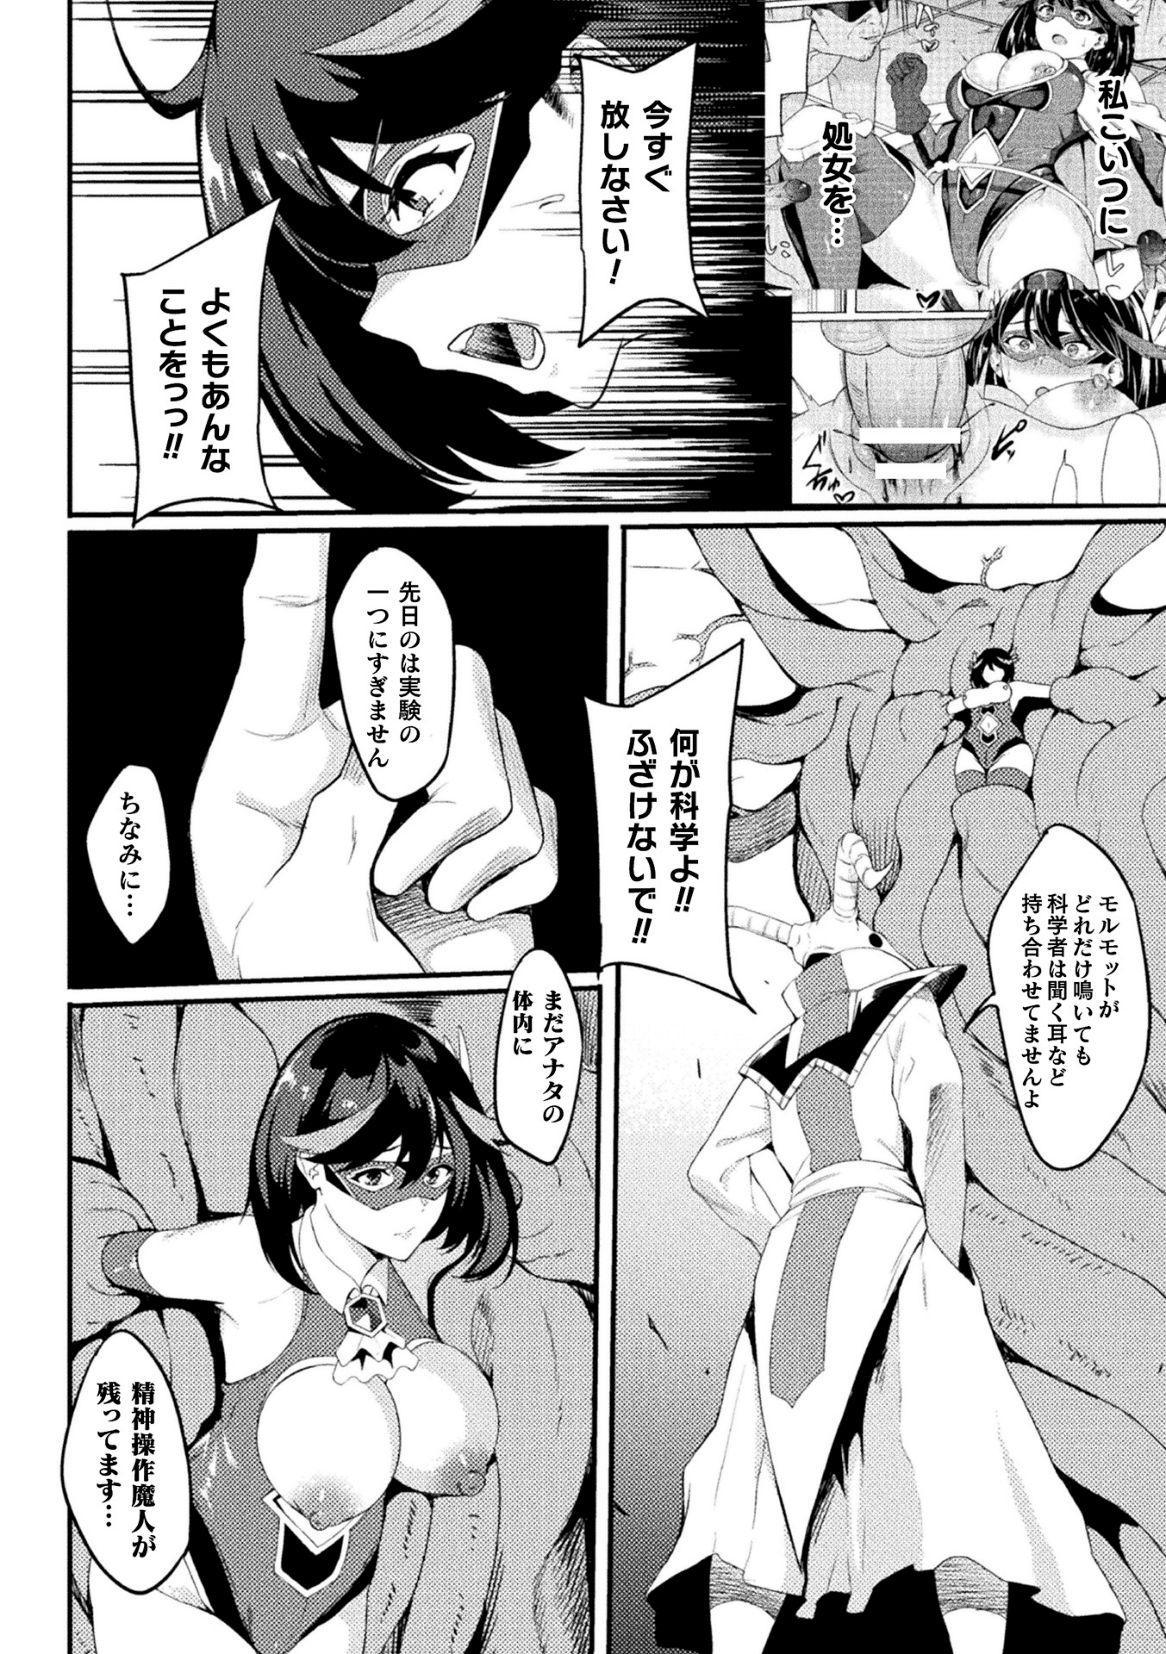 [Rinsun] Power Girl ~JK Super Heroine no Saiin Darakuki~ Ch. 2 3